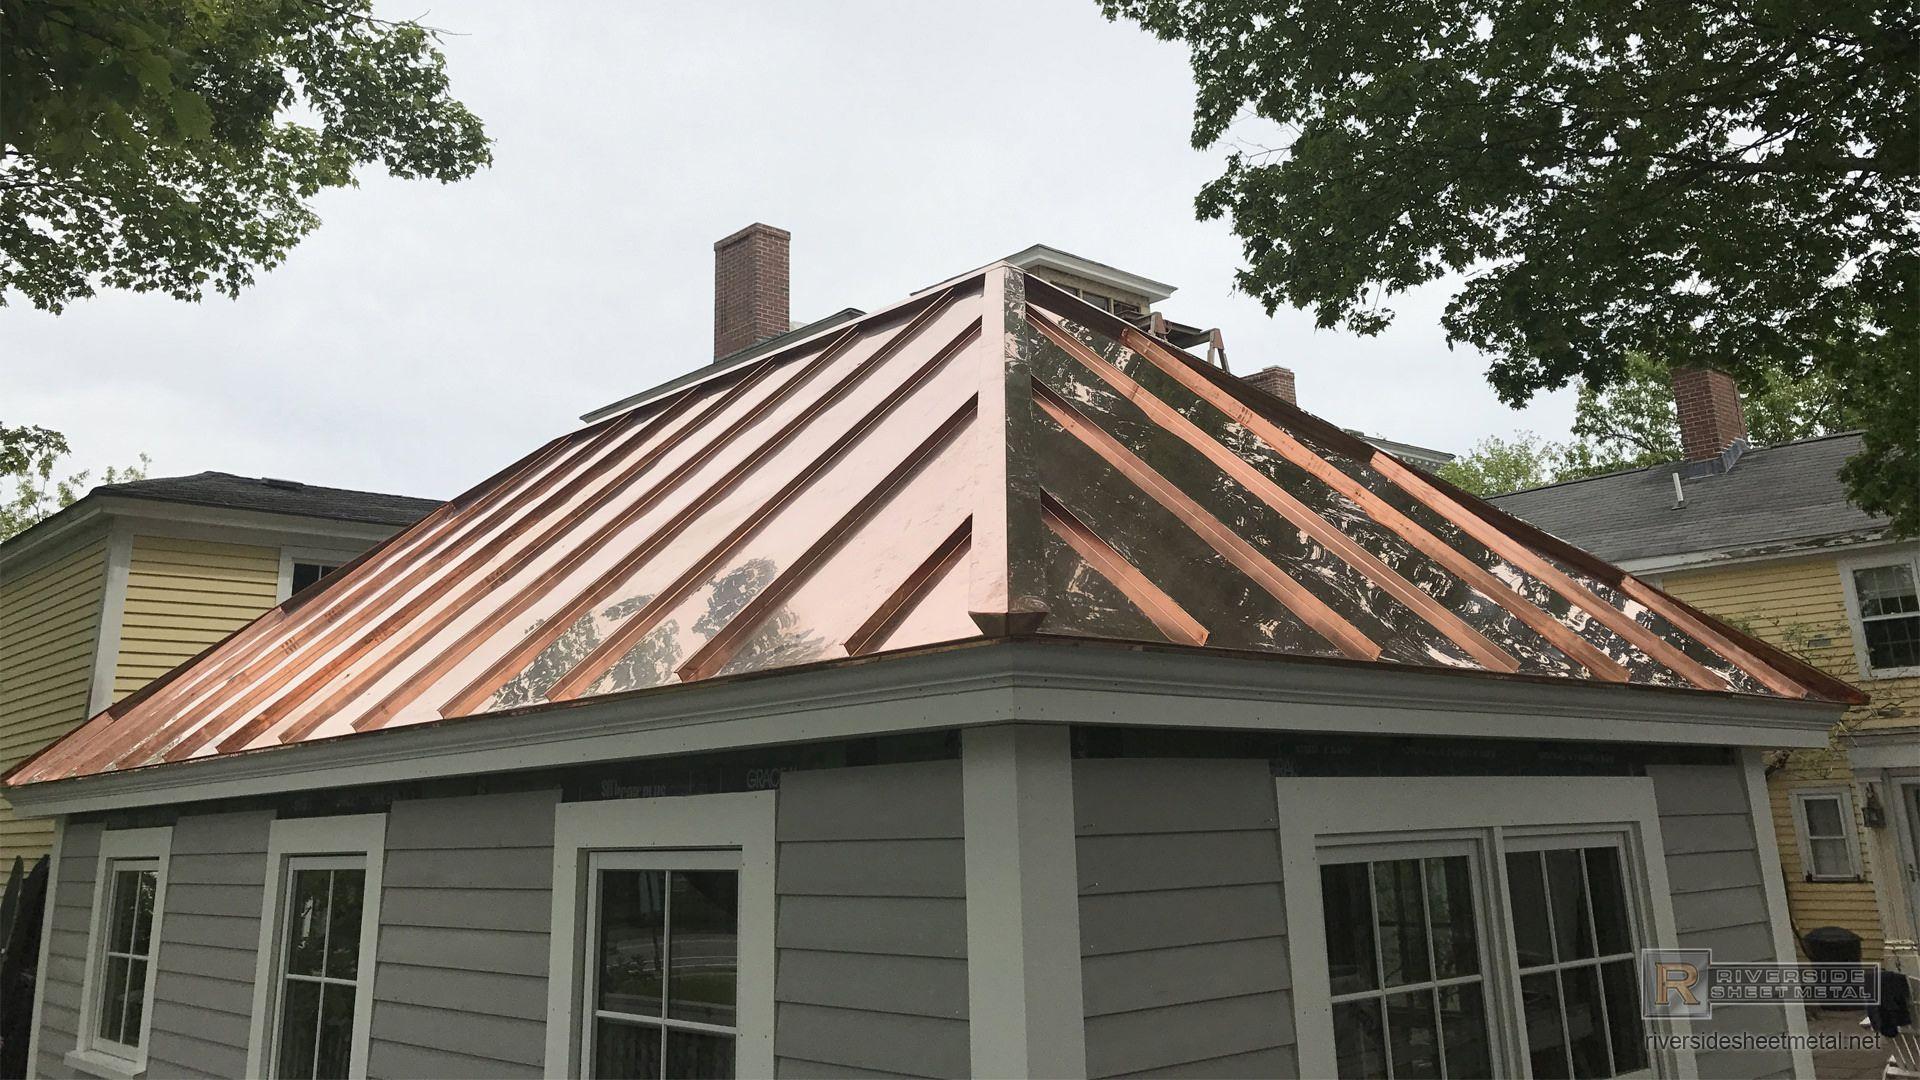 Google Image Result For Https Www Riversidesheetmetal Net Metal Roofing Standing Seam Copper Panel Shed Ins In 2020 Metal Roof Standing Seam Metal Roof Standing Seam